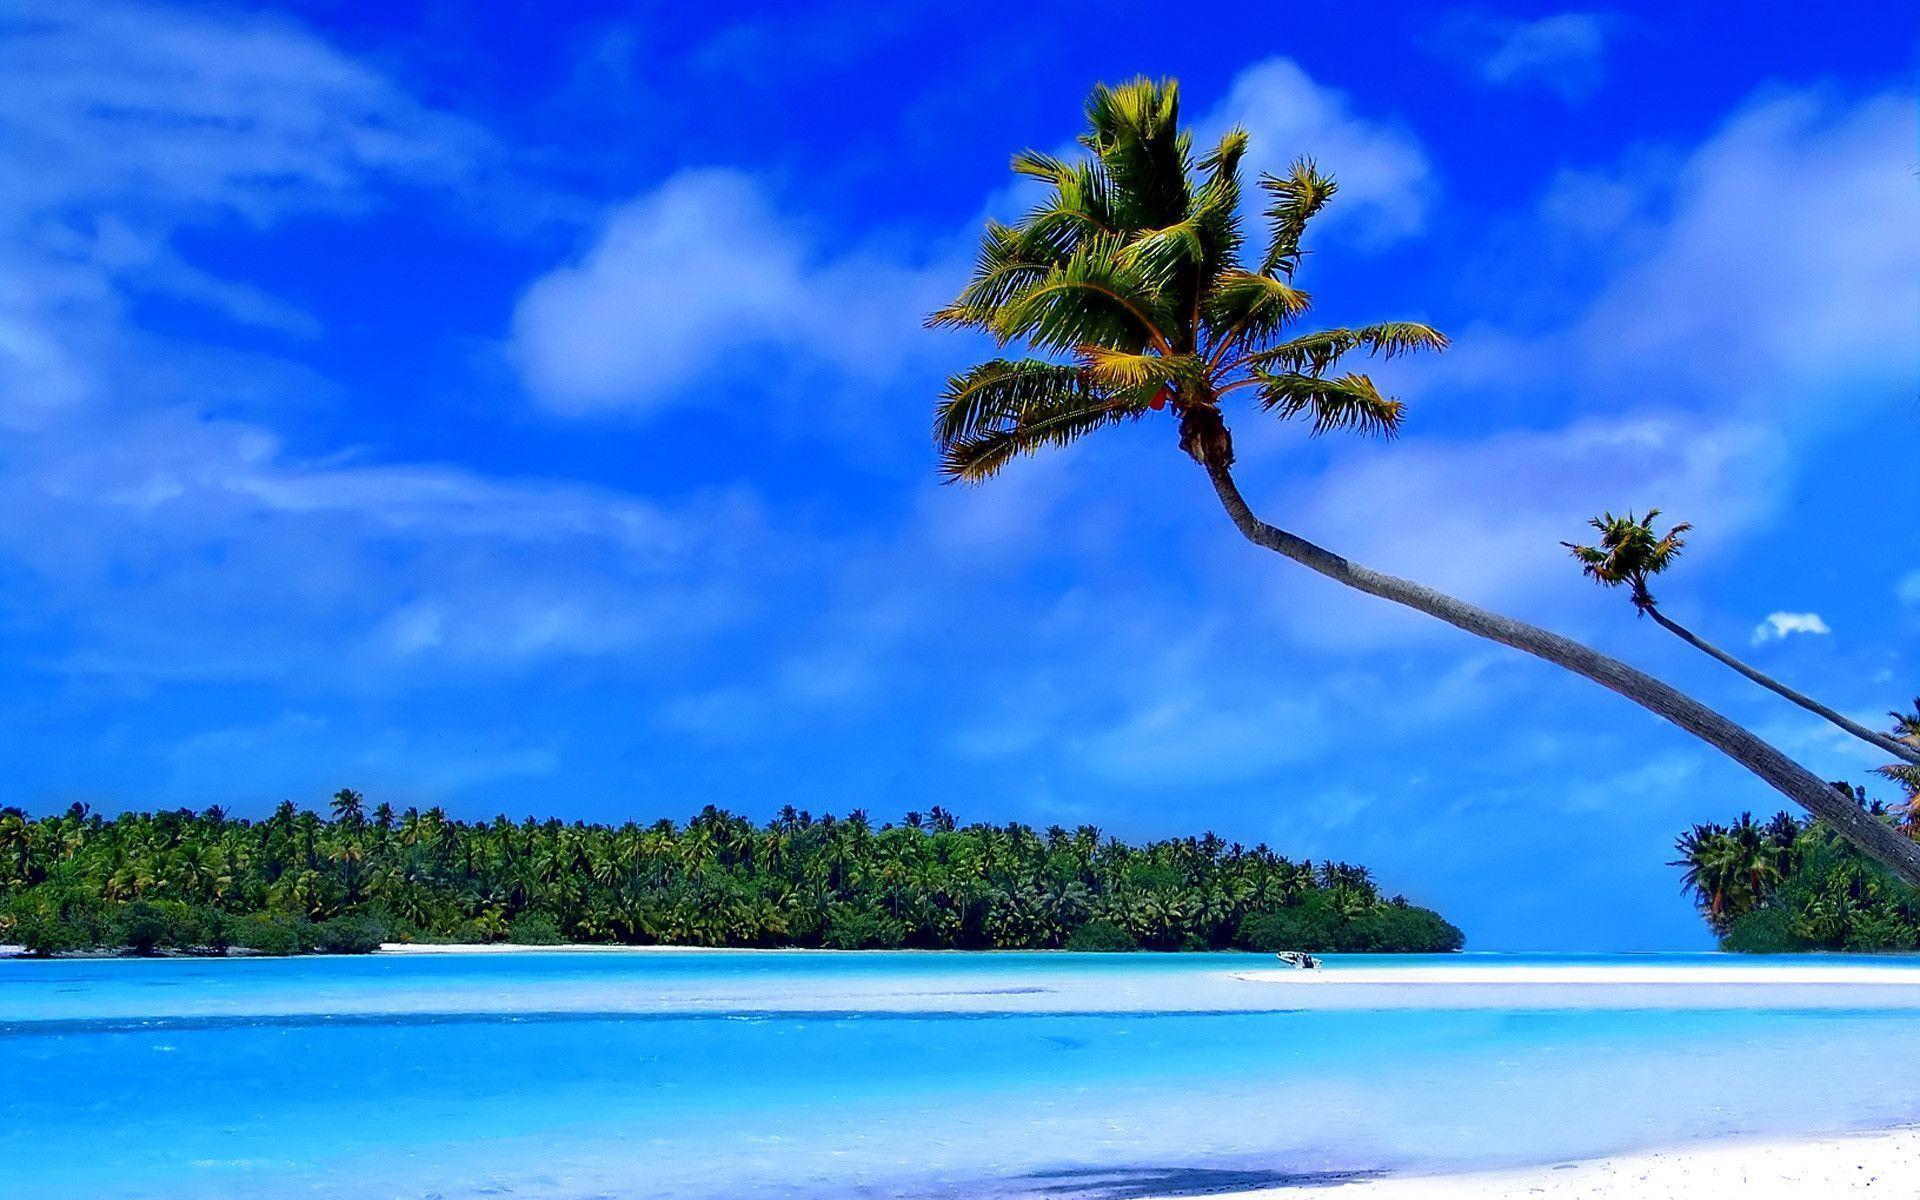 Caribbean Islands Wallpapers Top Free Caribbean Islands Backgrounds Wallpaperaccess